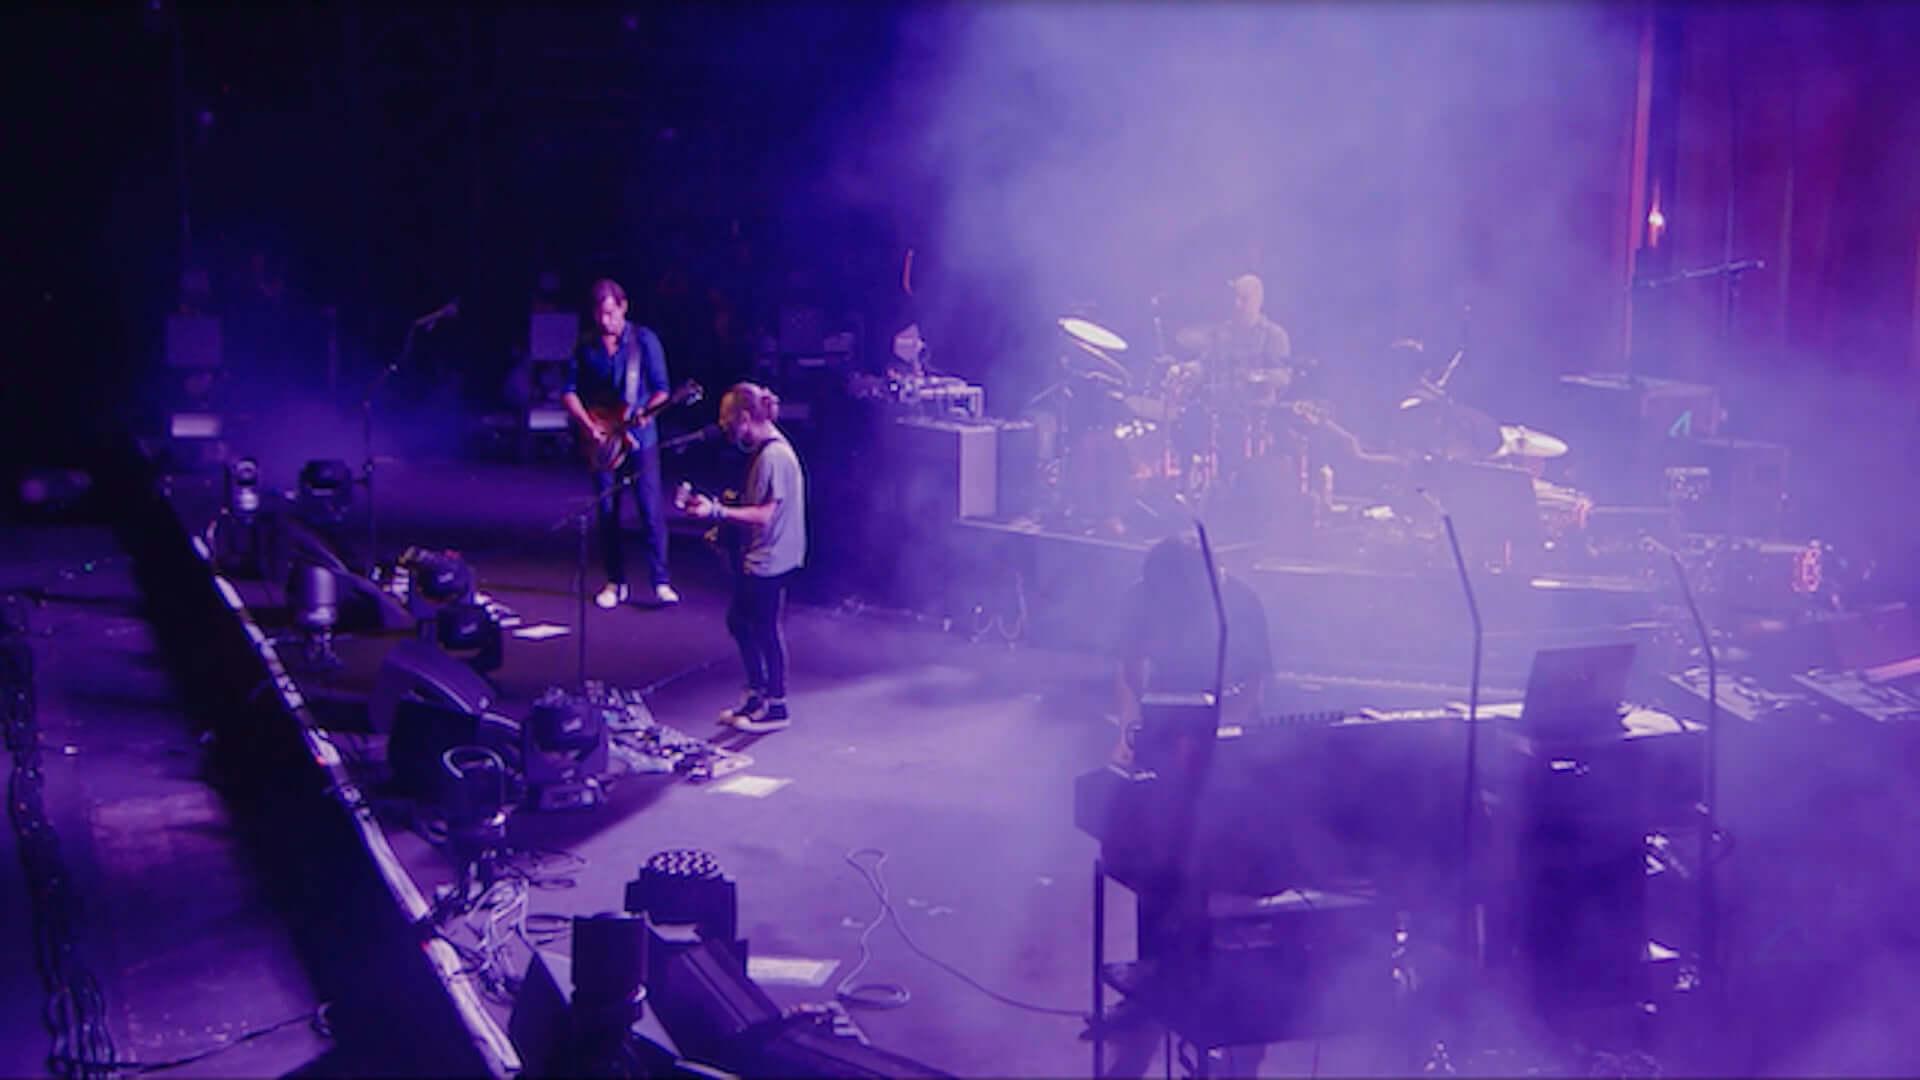 Radioheadが<SUMMER SONIC 2016>でのライブ映像をYouTubeで今夜公開!Thom Yorkeの限定グッズも発売中 music200514_radiohead_1-1920x1080